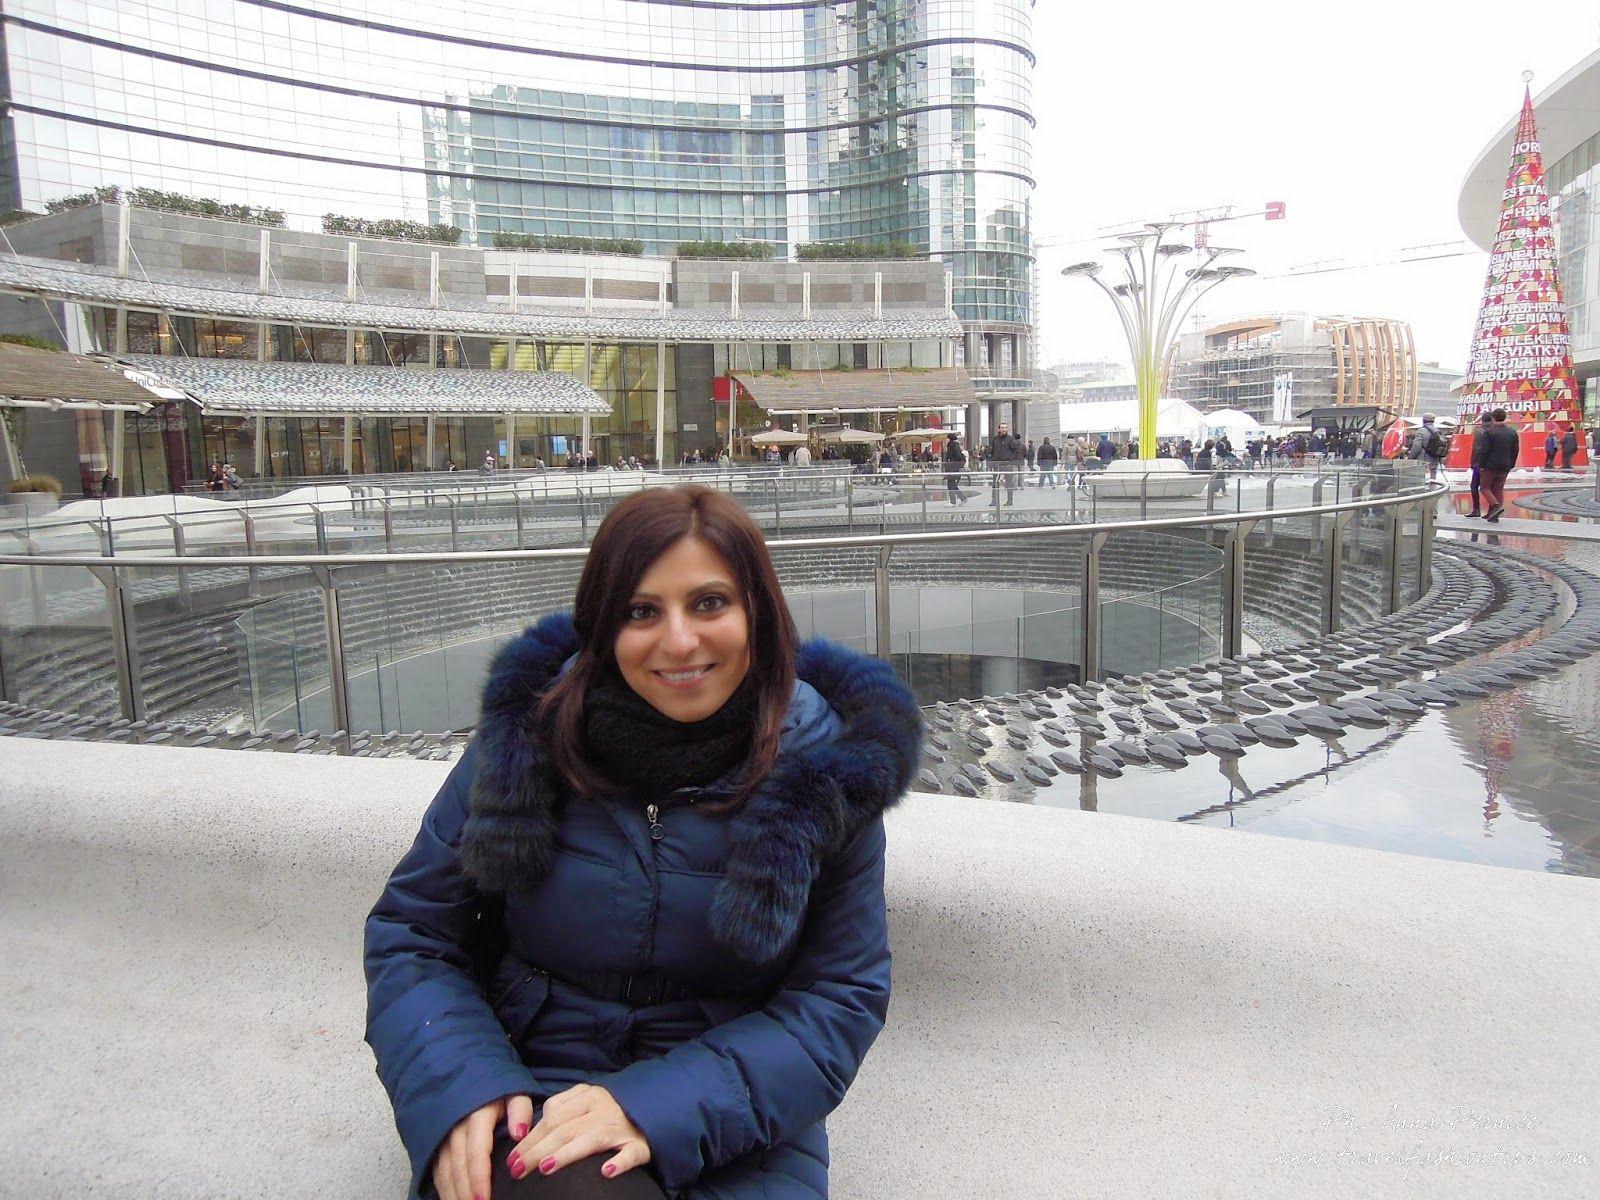 Mercatini di Natale a Milano - Travel and Fashion Tips by Anna Pernice